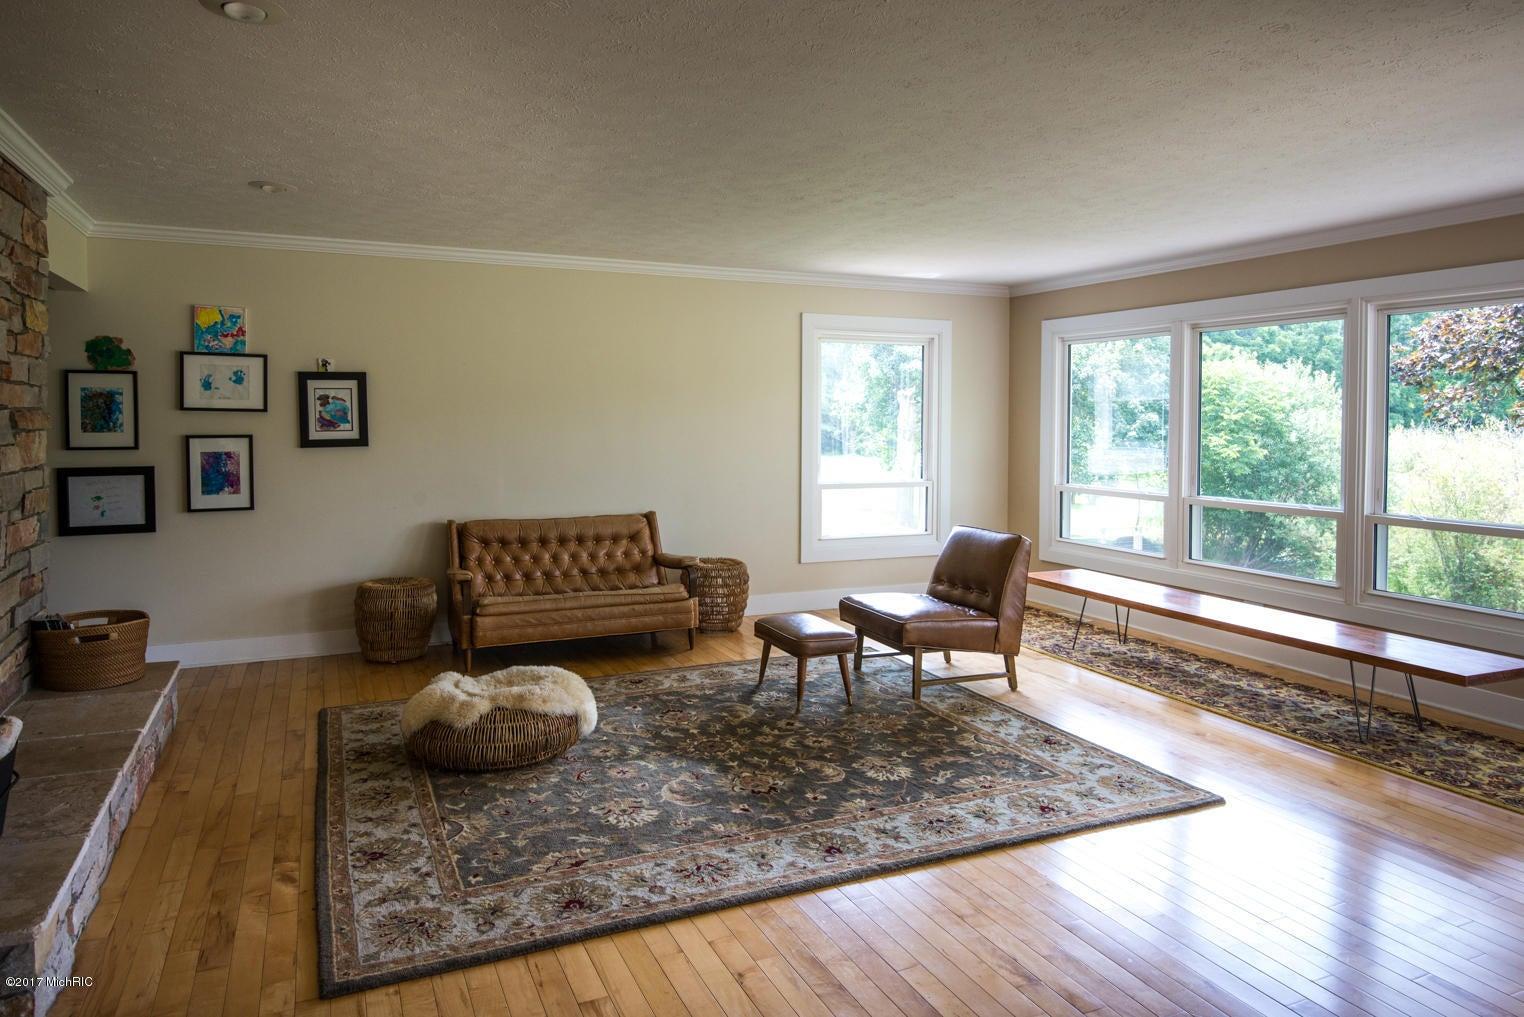 4334 sunnybrook drive kalamazoo mi 49008 sold listing for Hardwood floors kalamazoo